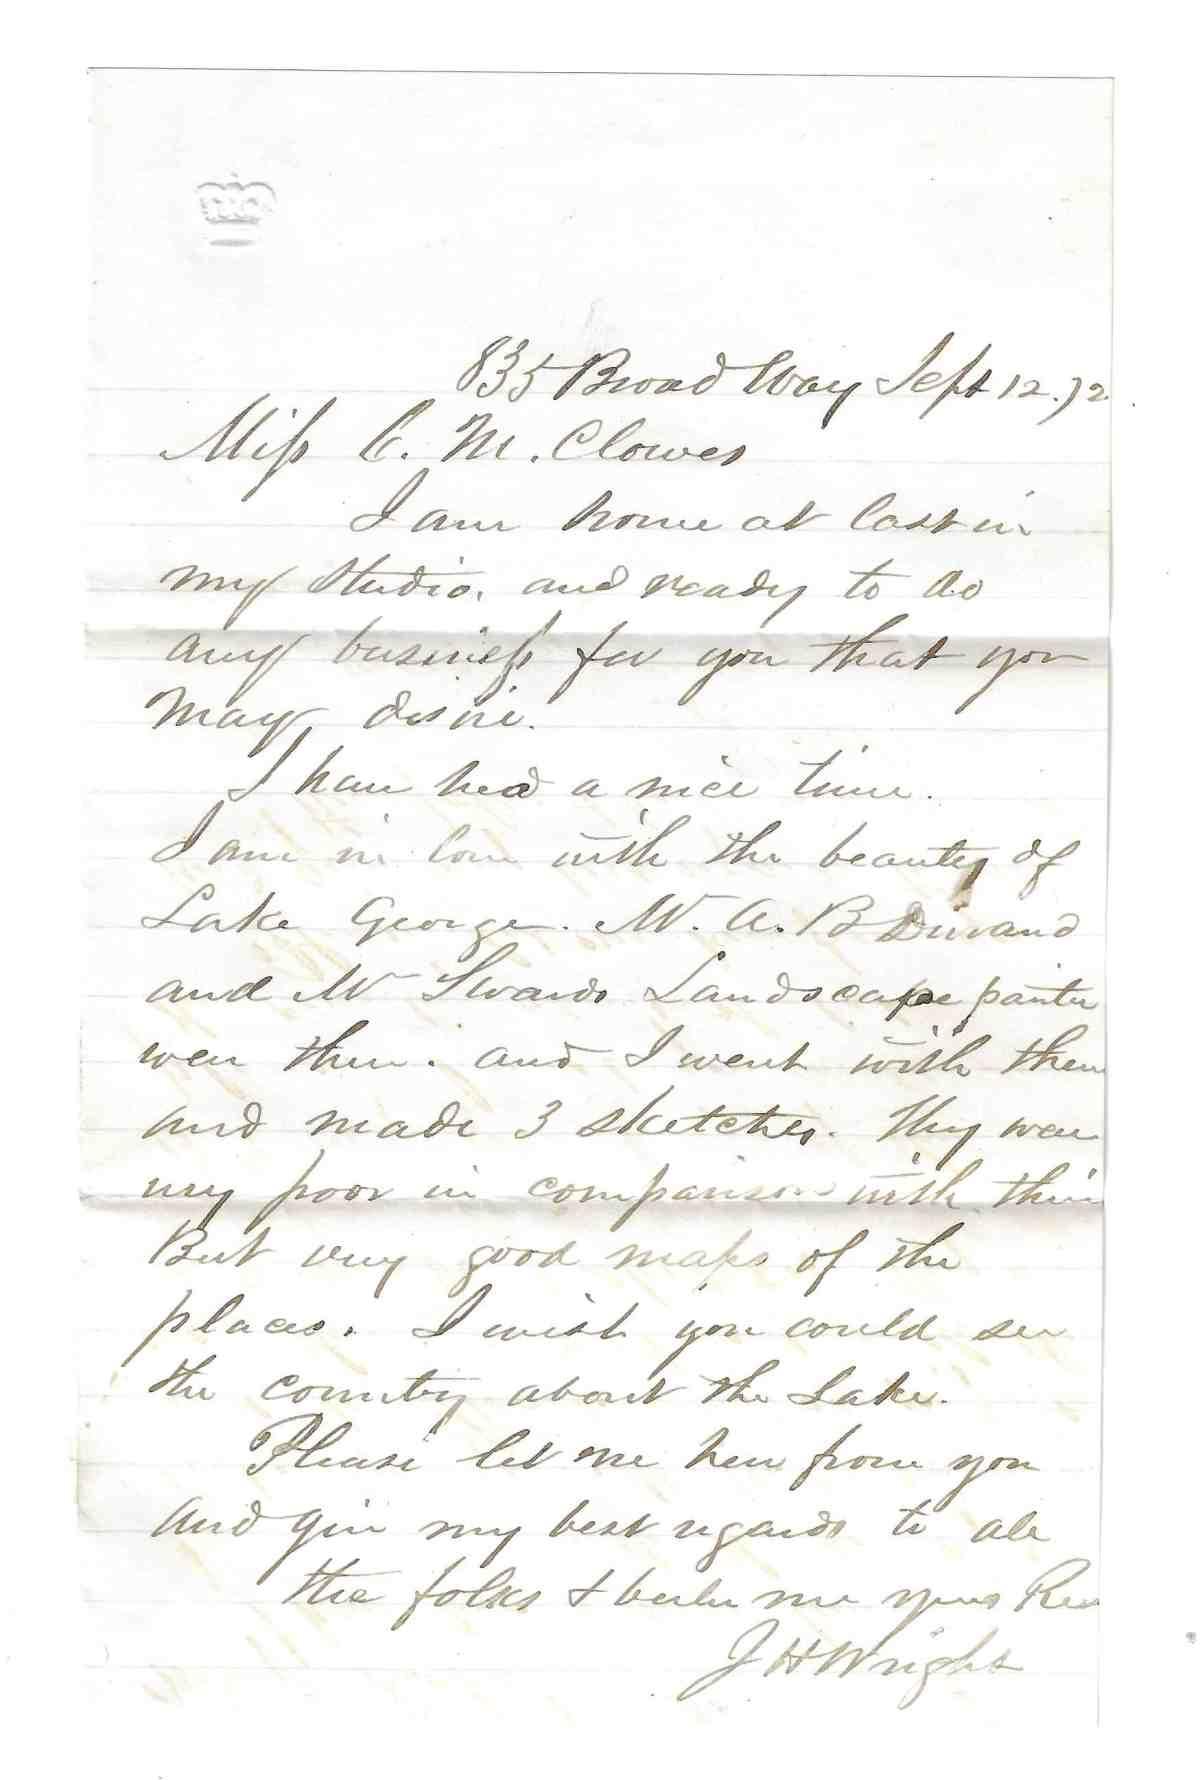 CMCE J H Wright 1872 SEP 12